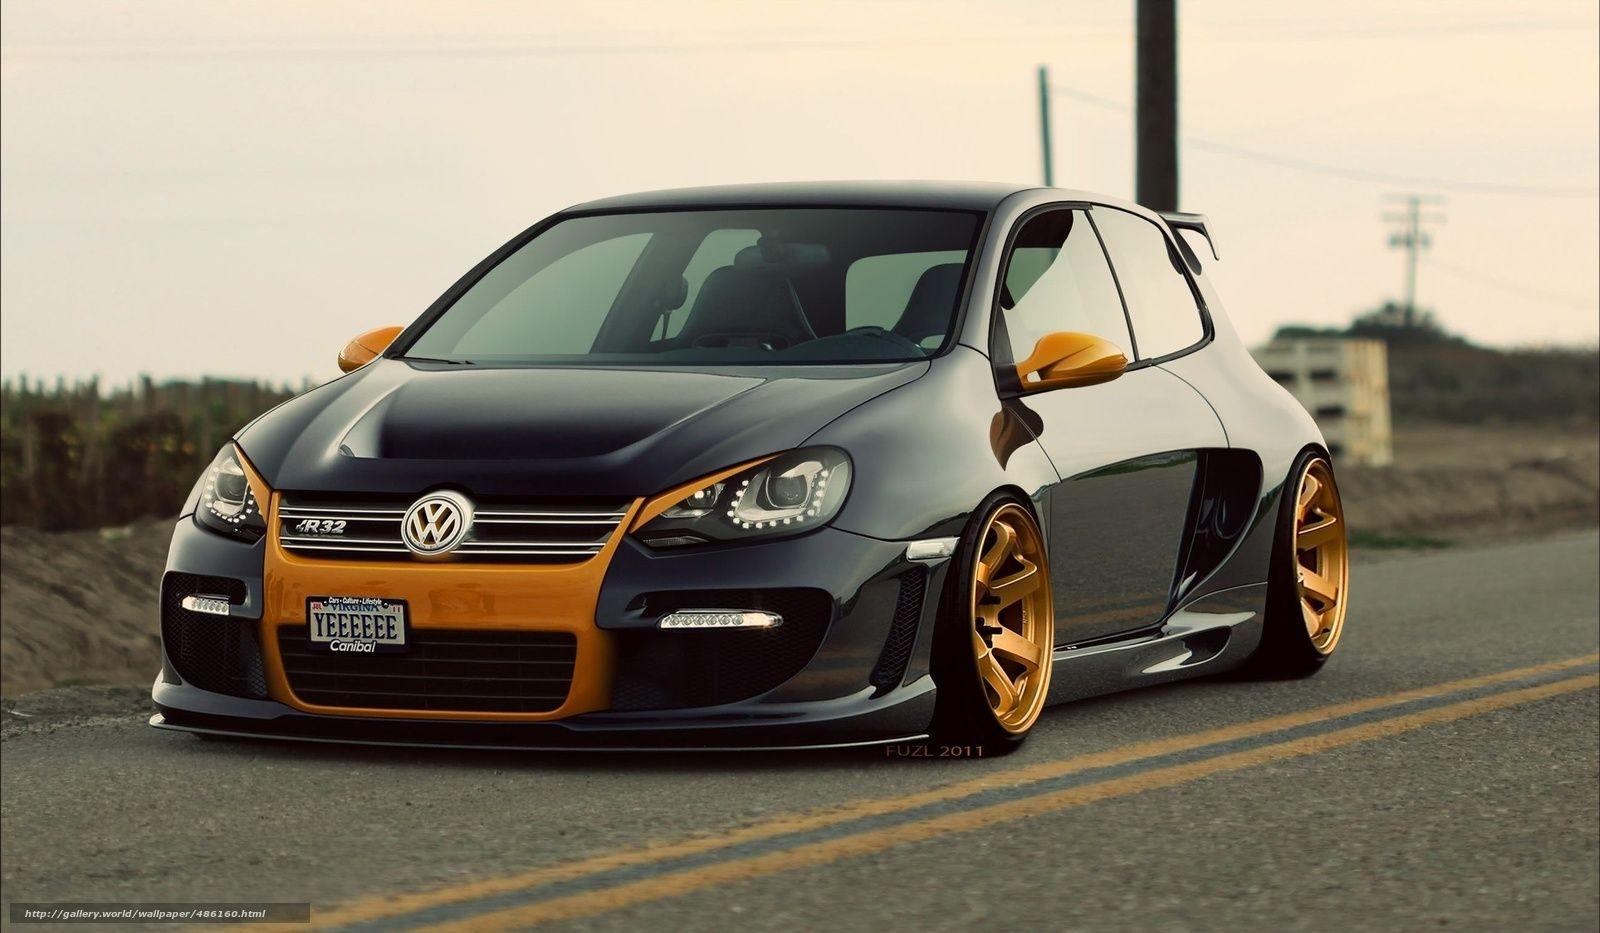 Epingle Par Gui Sur Sport Back Family Car Custom Mods En 2020 Volkswagen Voiture Golf Voiture